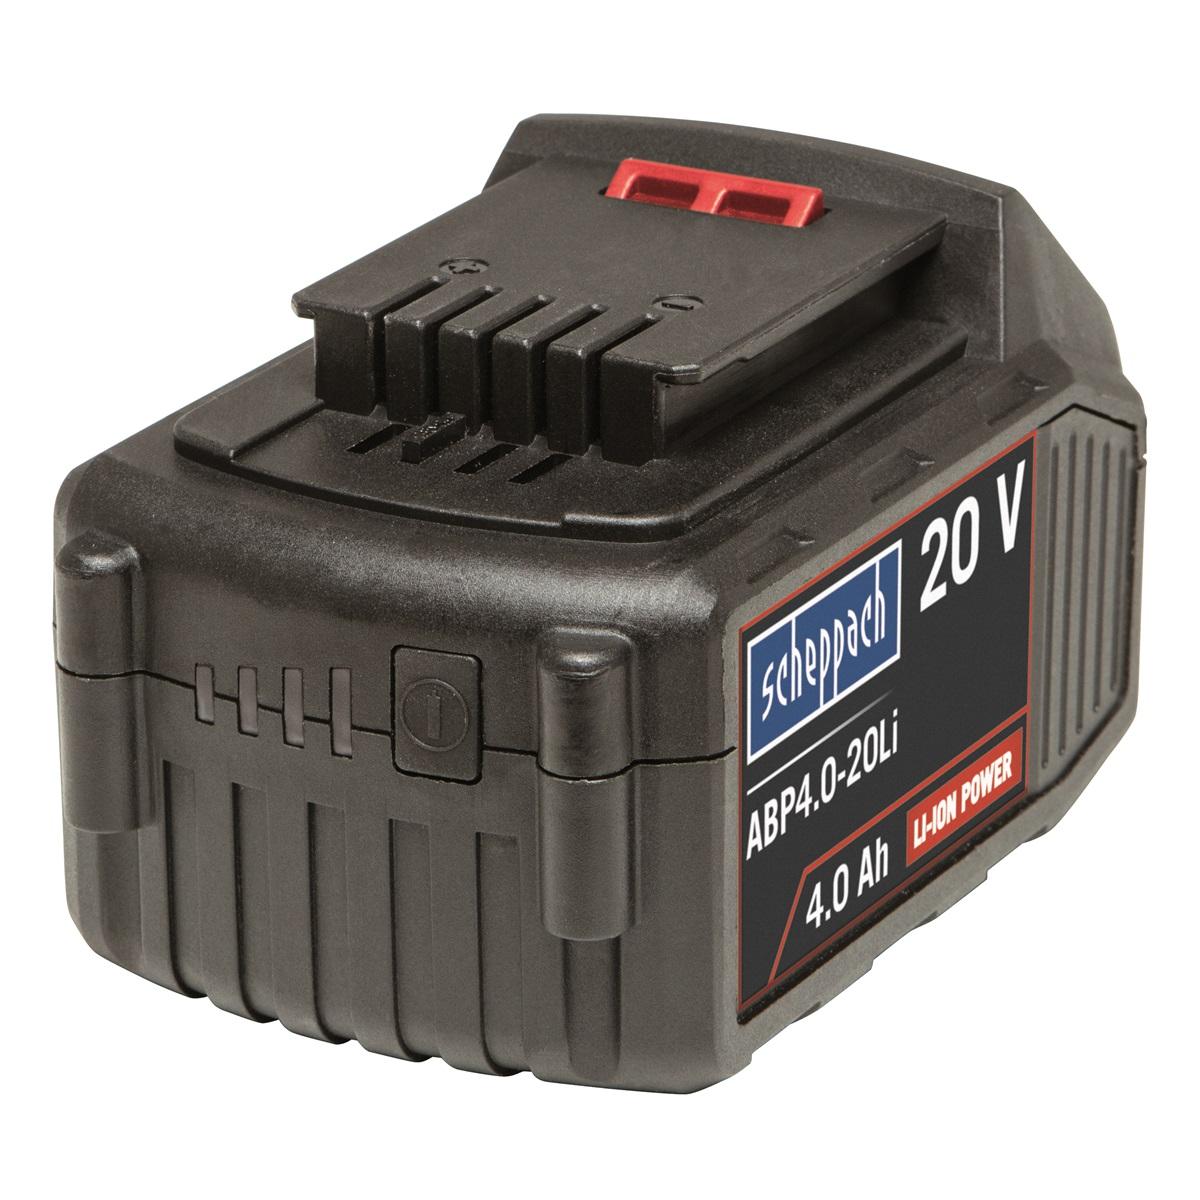 Scheppach ABP4.0-20Li, 20 V lithium iónová batérie 4 Ah